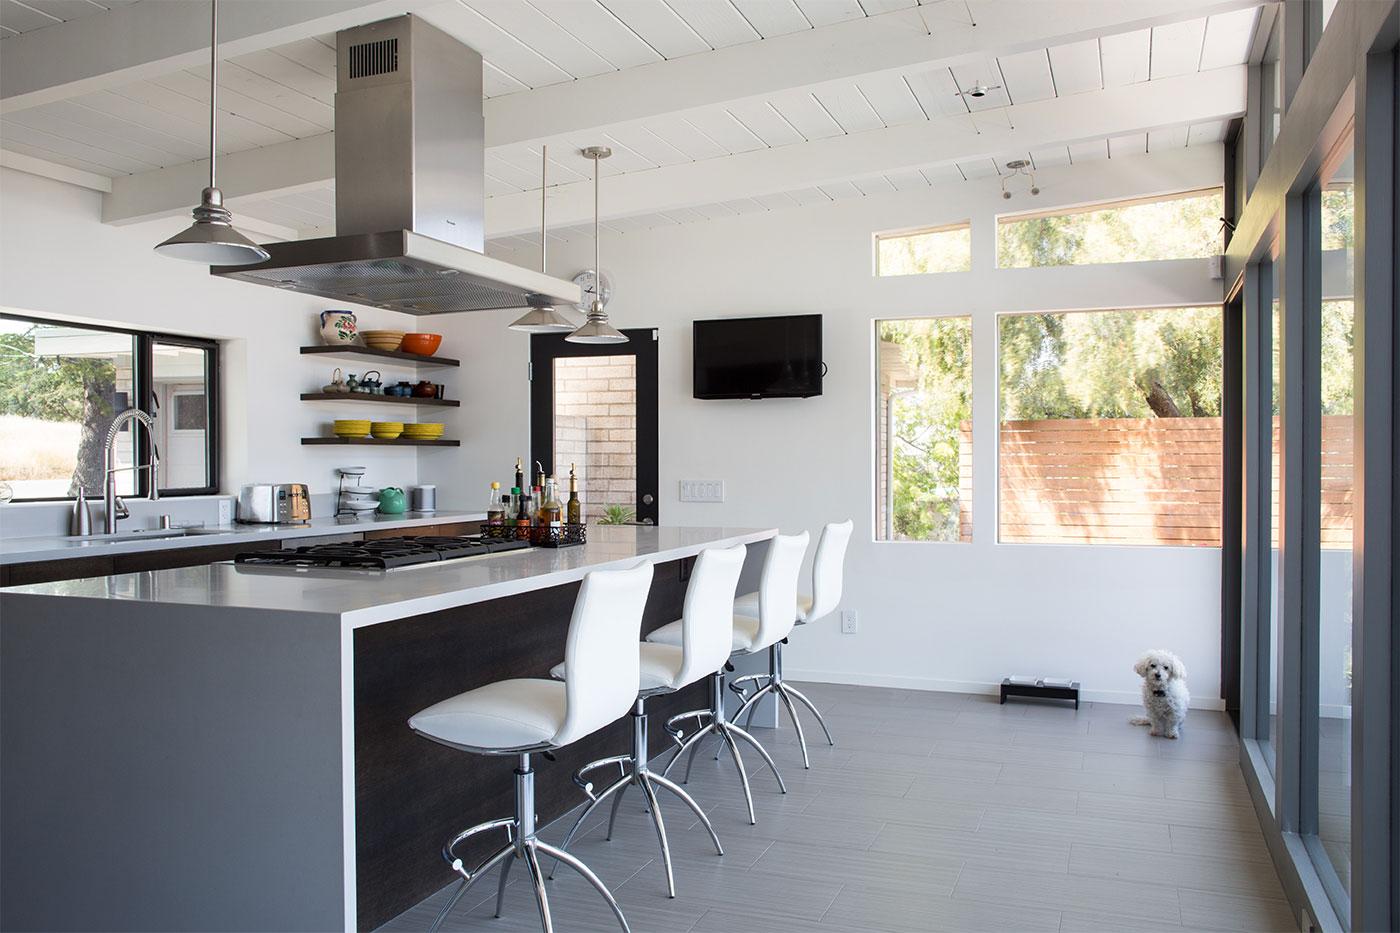 Kitchen Windows and Doors - SoFlo Kitchen Remodeling & Custom Cabinet Installation - backsplashes, flooring, countertops